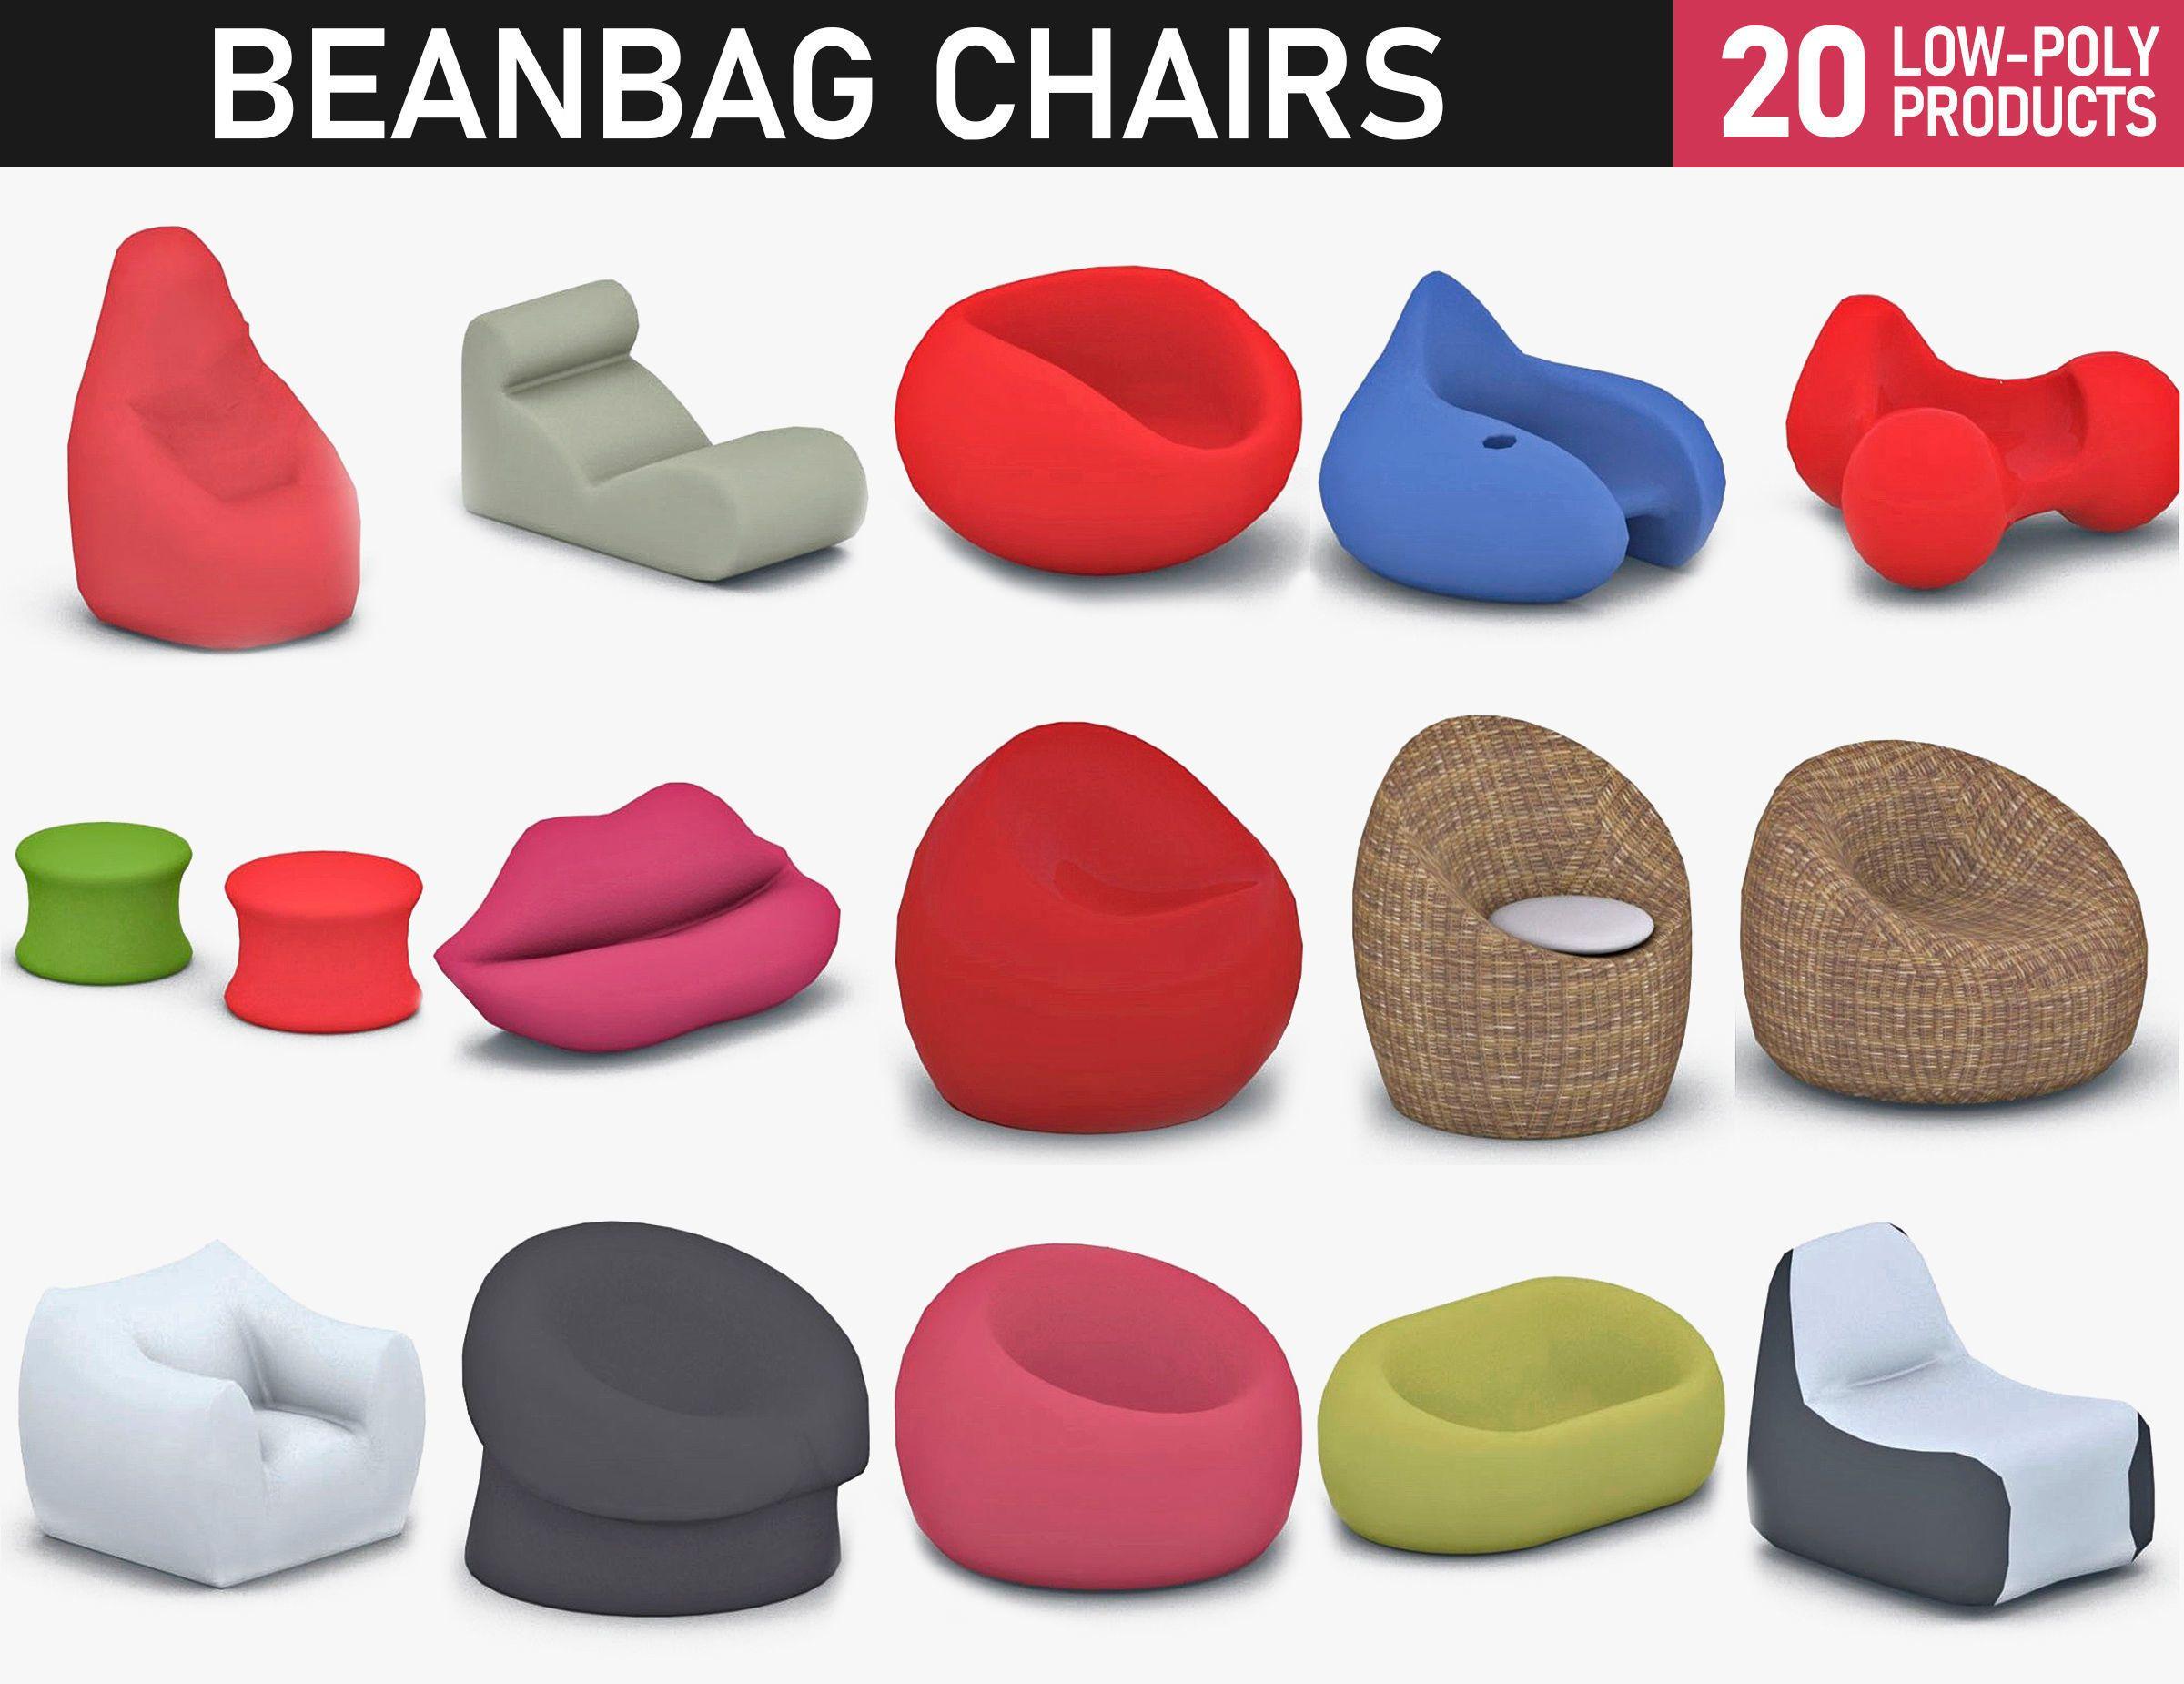 Bean Bag Chairs Collection 3d Model Bean Bag Chair Bean Bag Chair Pattern Bean Bag